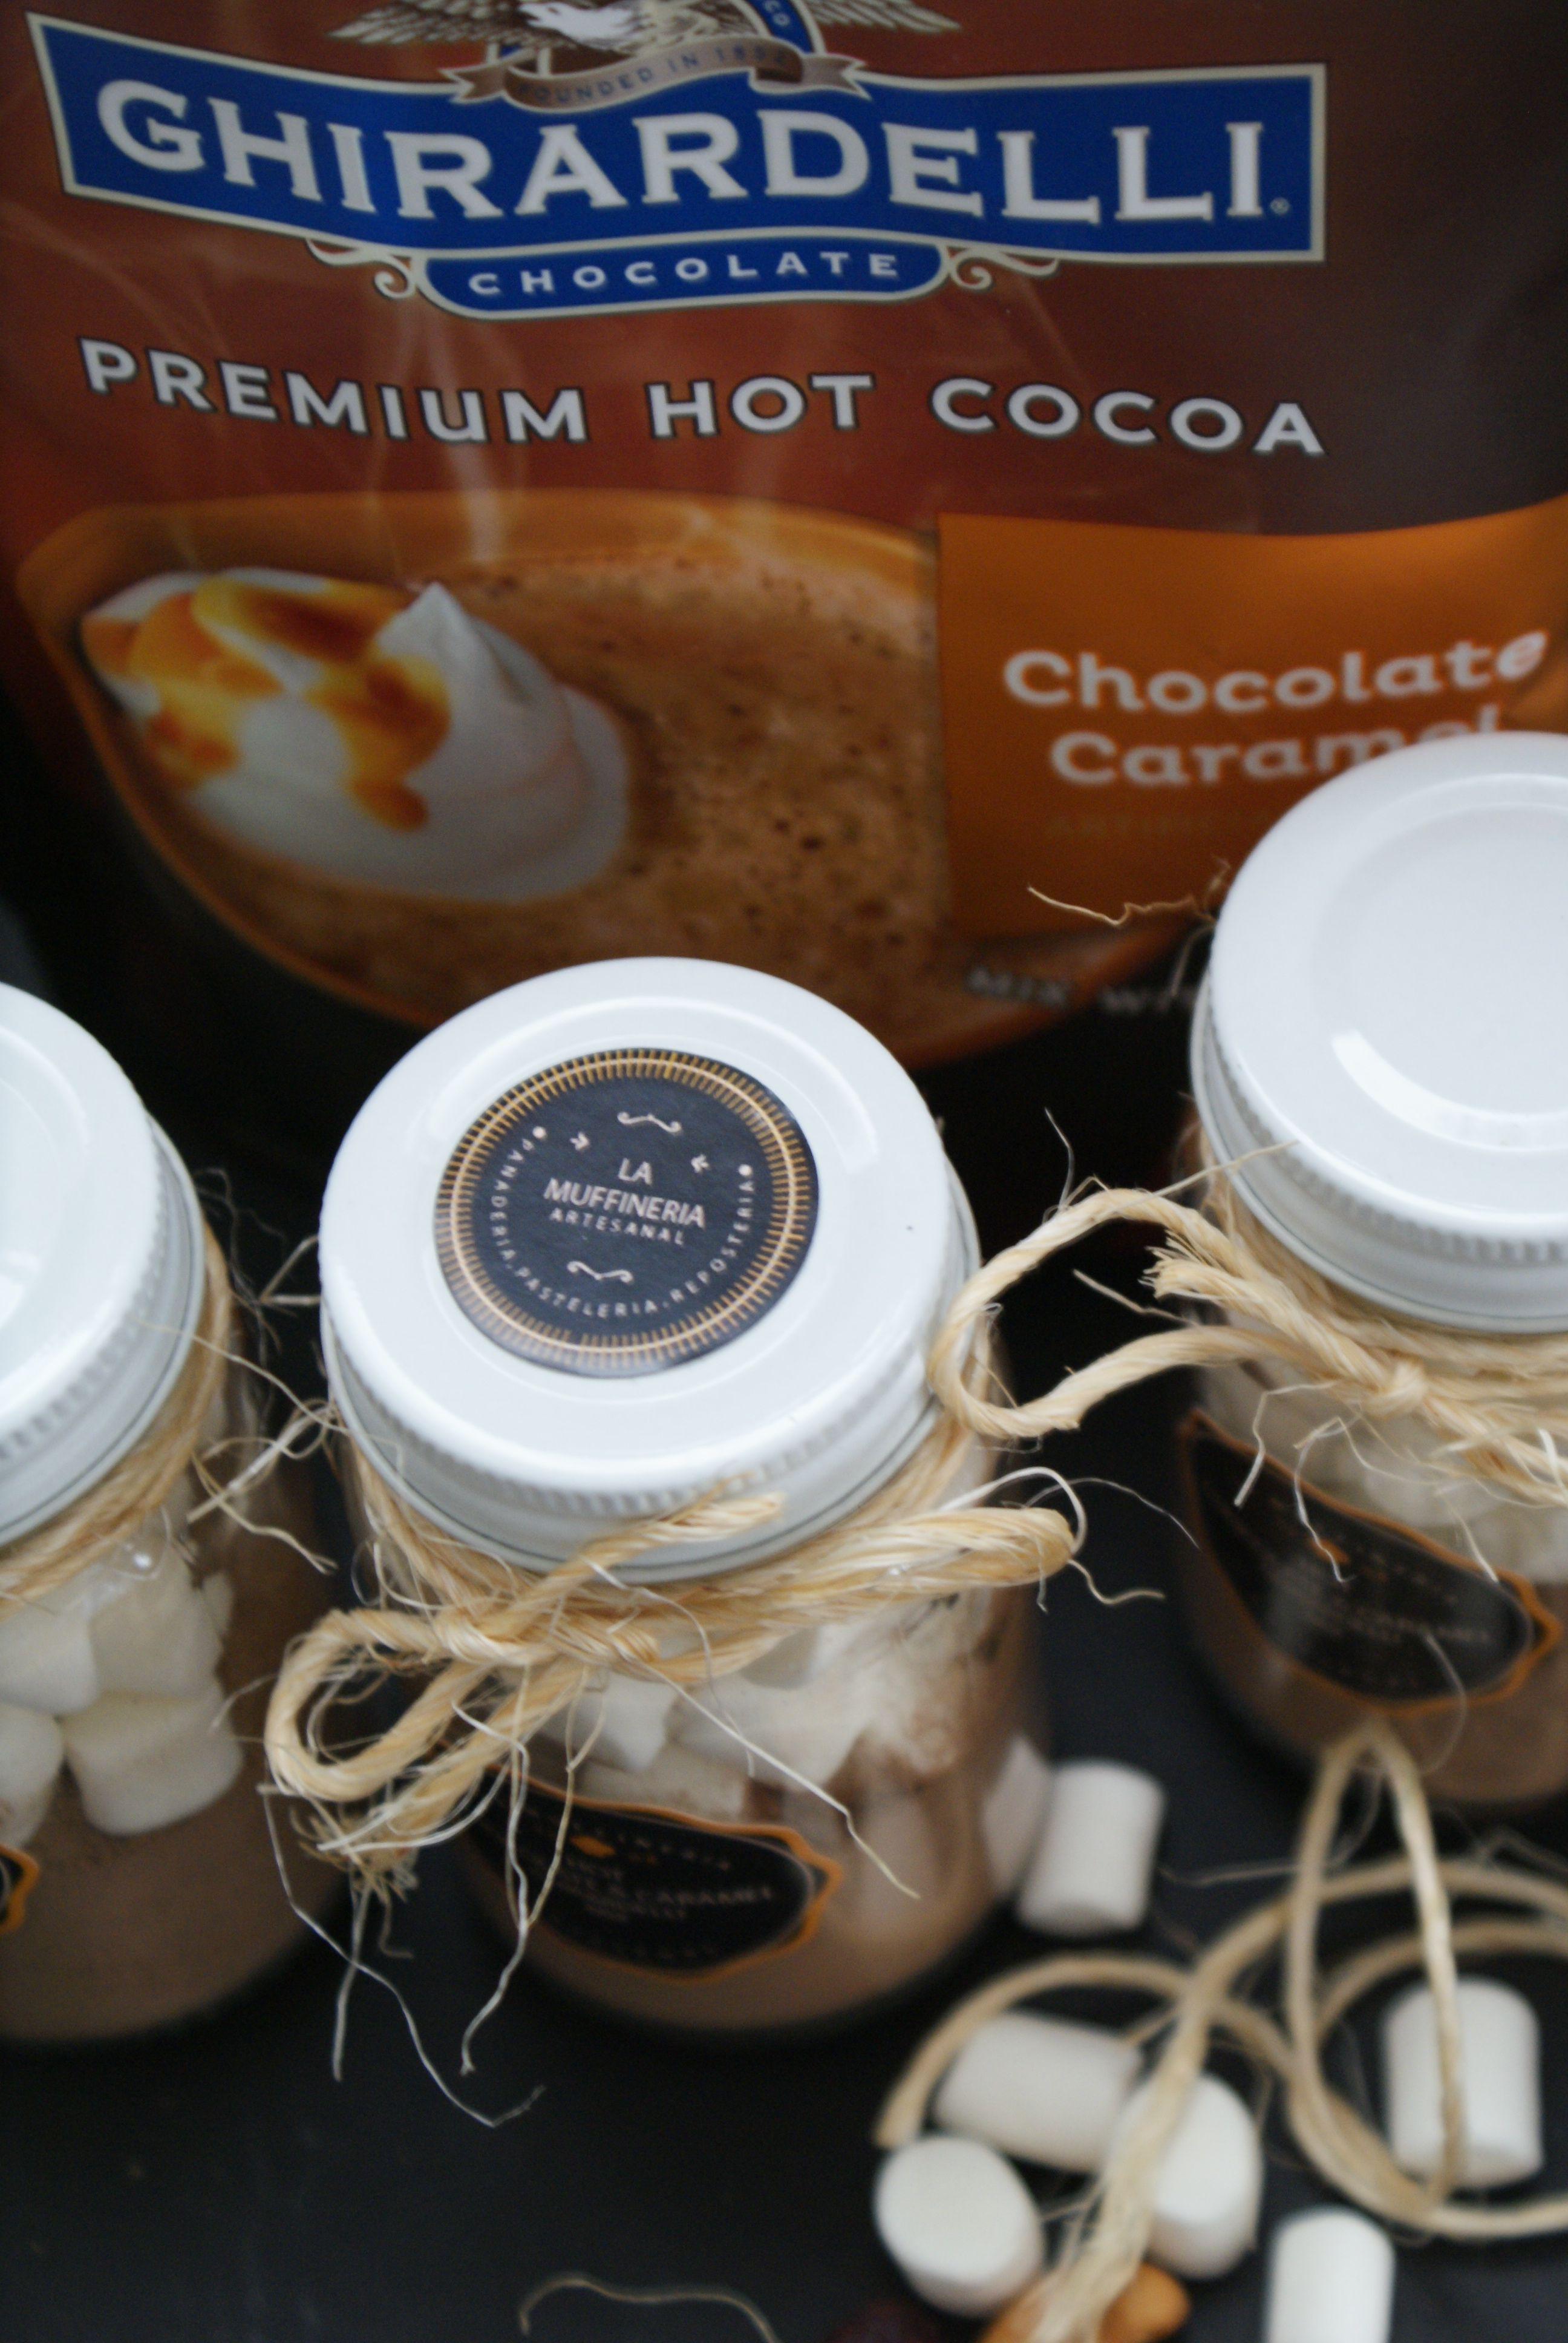 Hot cocoa chocolate & caramel Ghirardelli mix www.facebook.com/lamuffineriareposteriaoficial hand made, marshmallows, black tags.